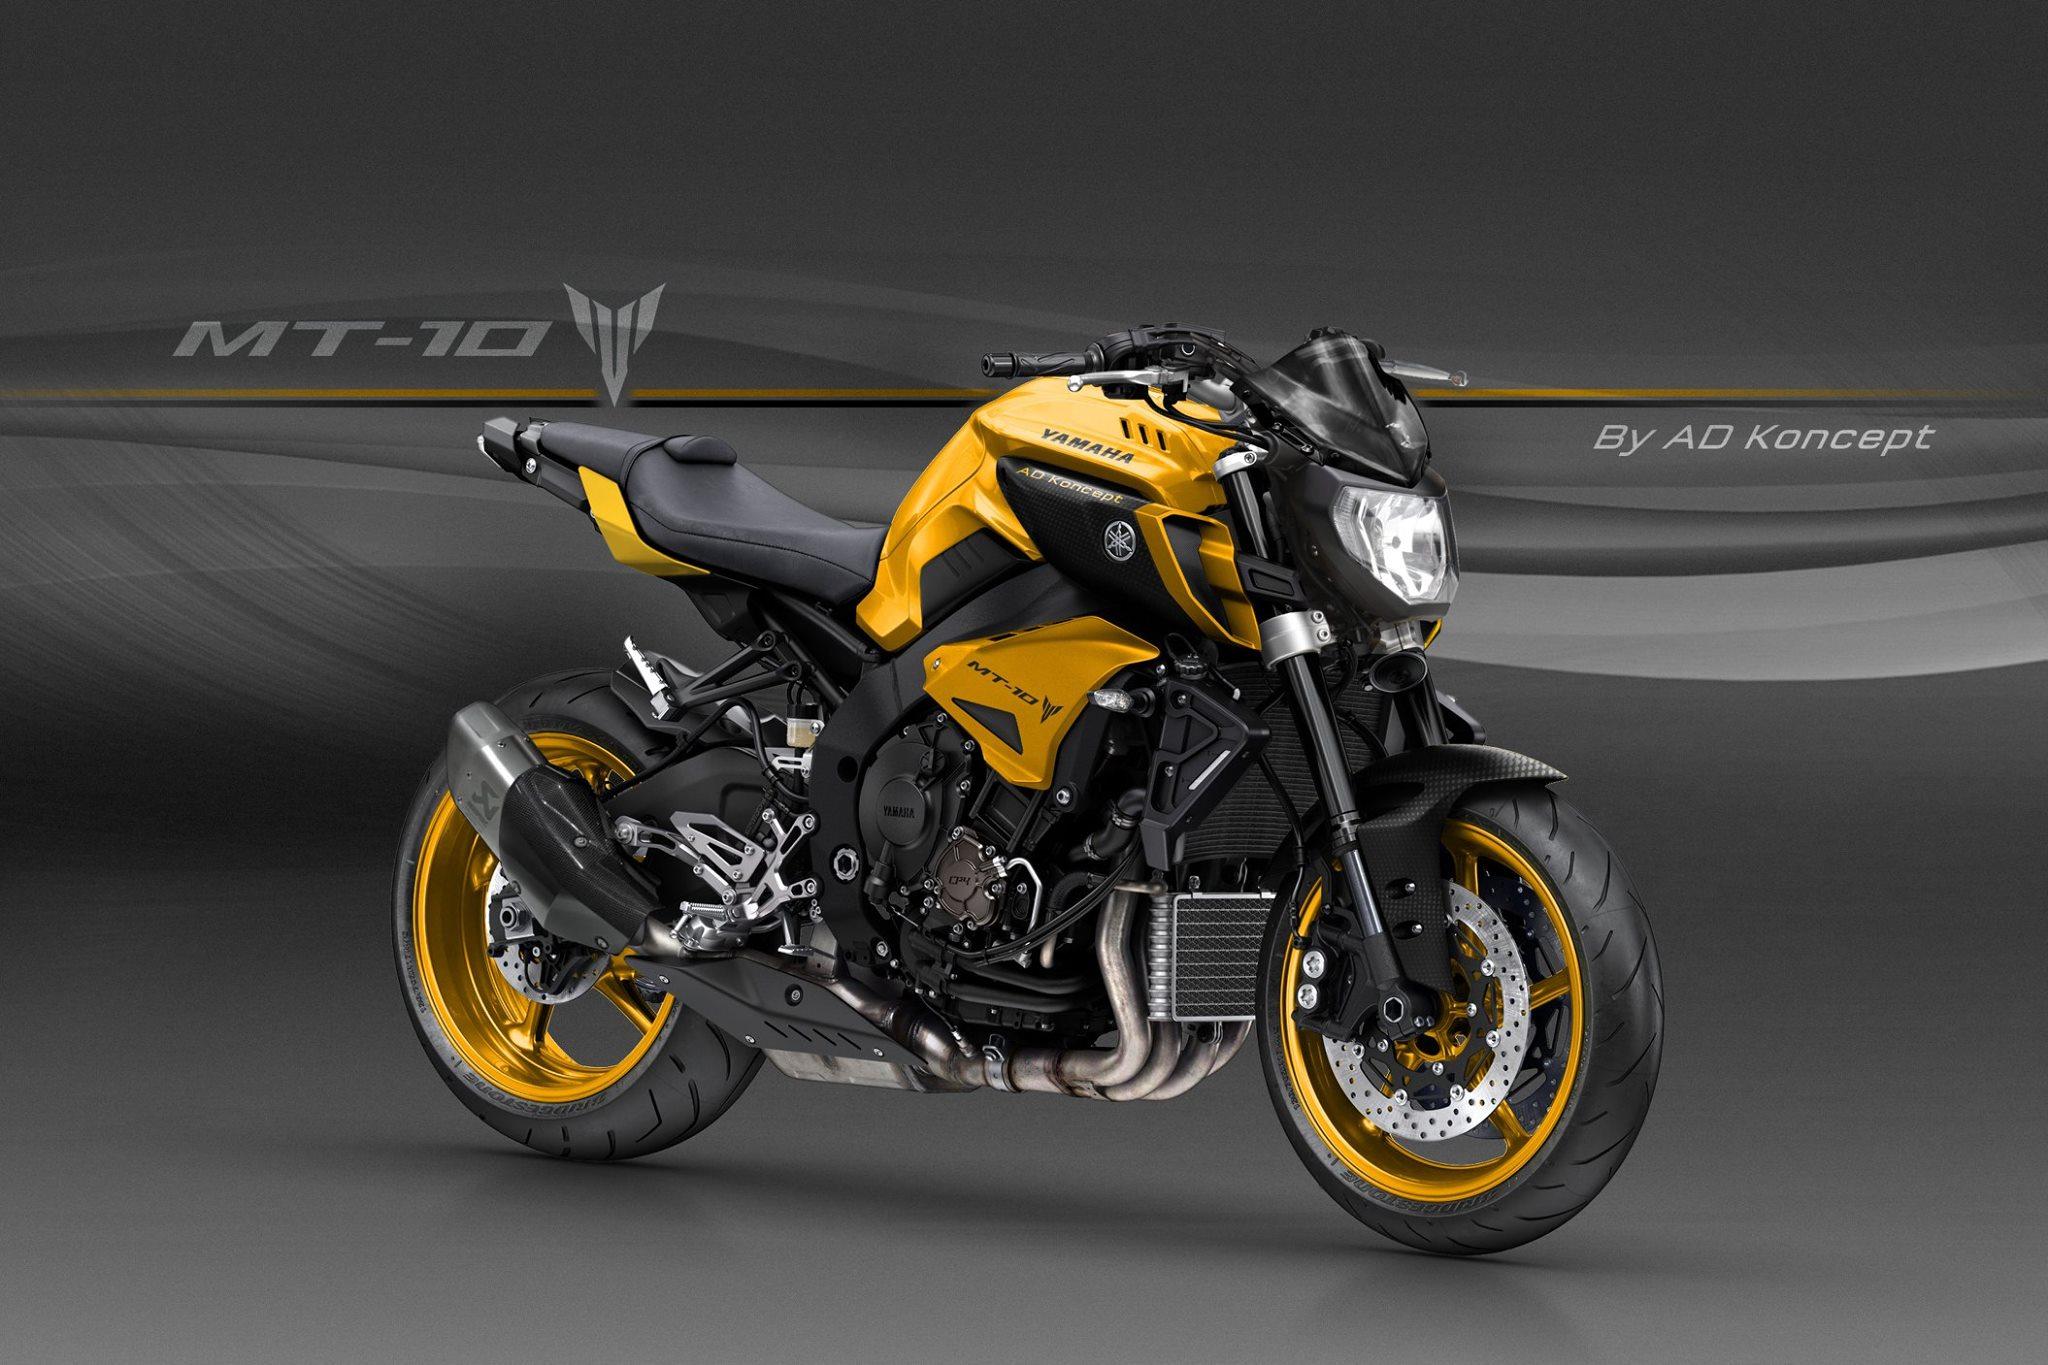 Yamaha lance la ... MT-10 ! Officiel ! - Page 4 552718122480371940913809265771482293550882546994o